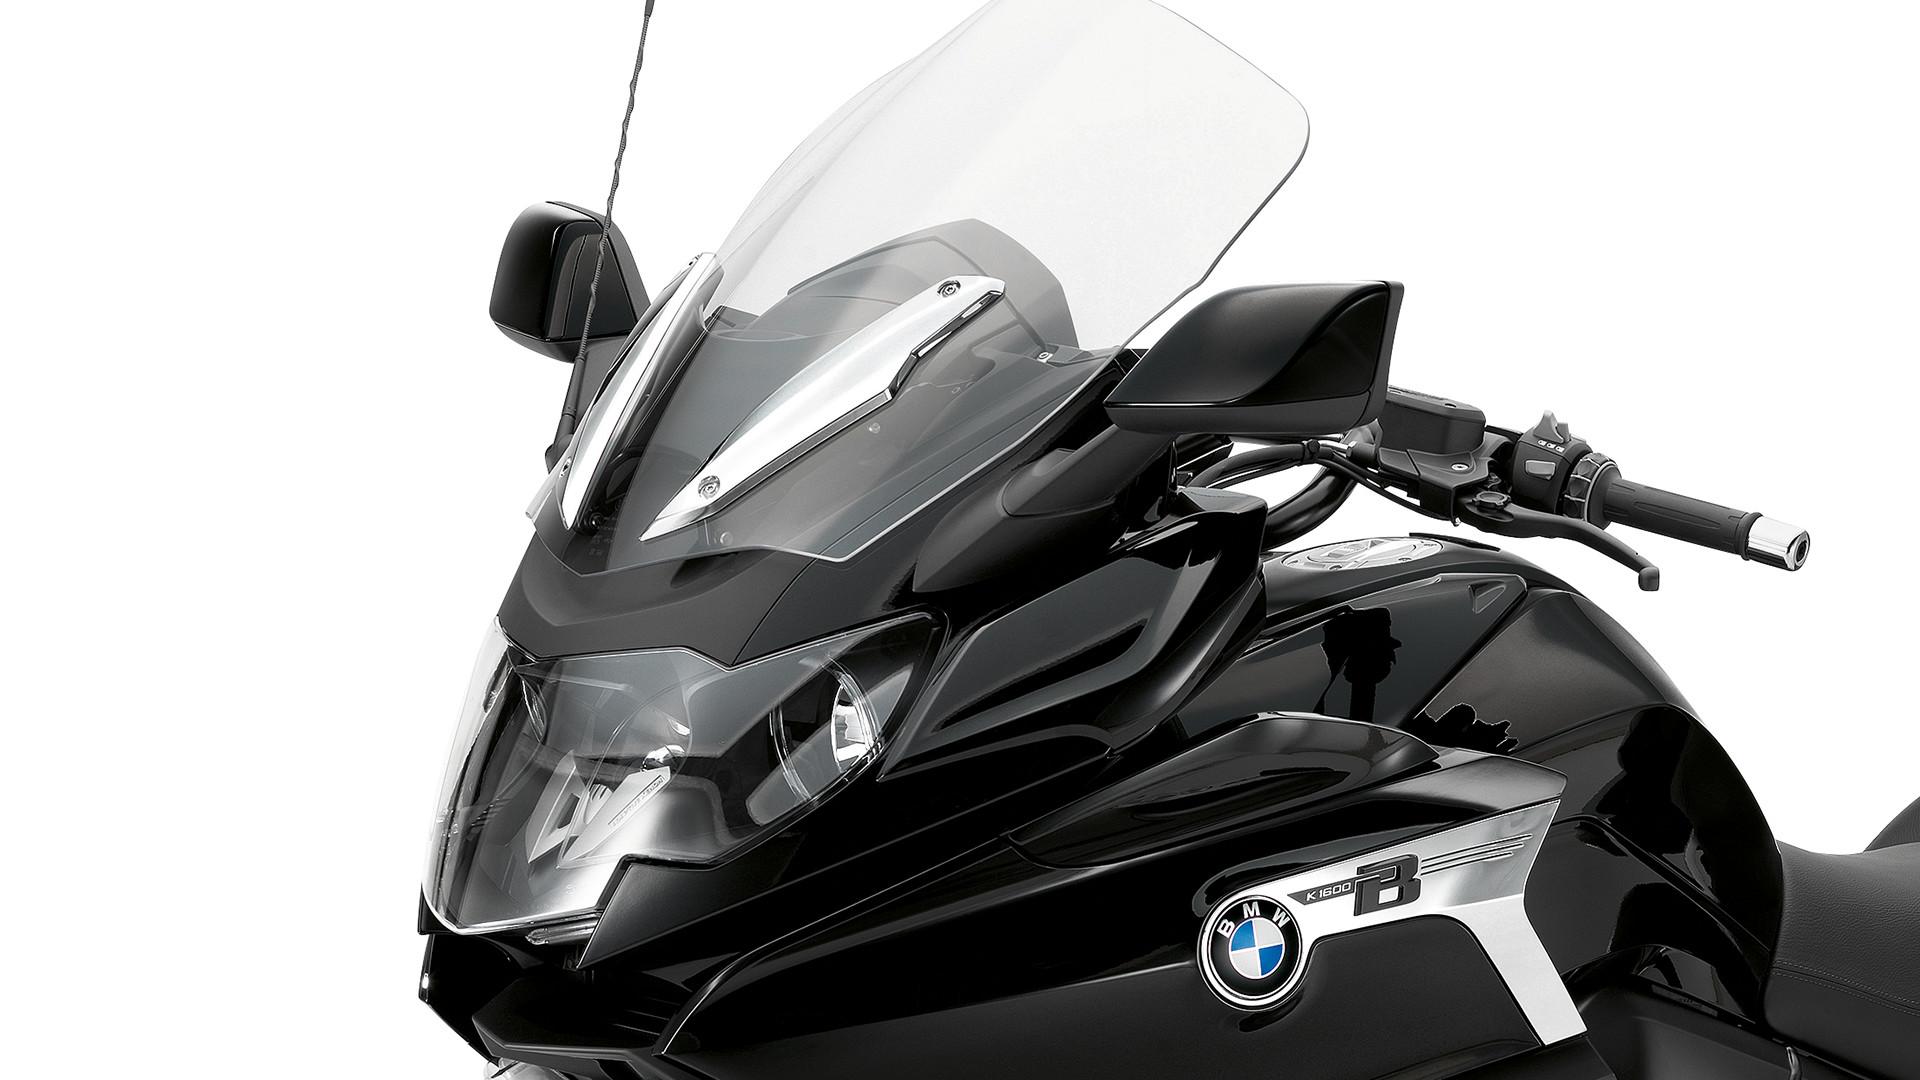 K 1600 Grand America Bmw Motorcycles Of Riverside California